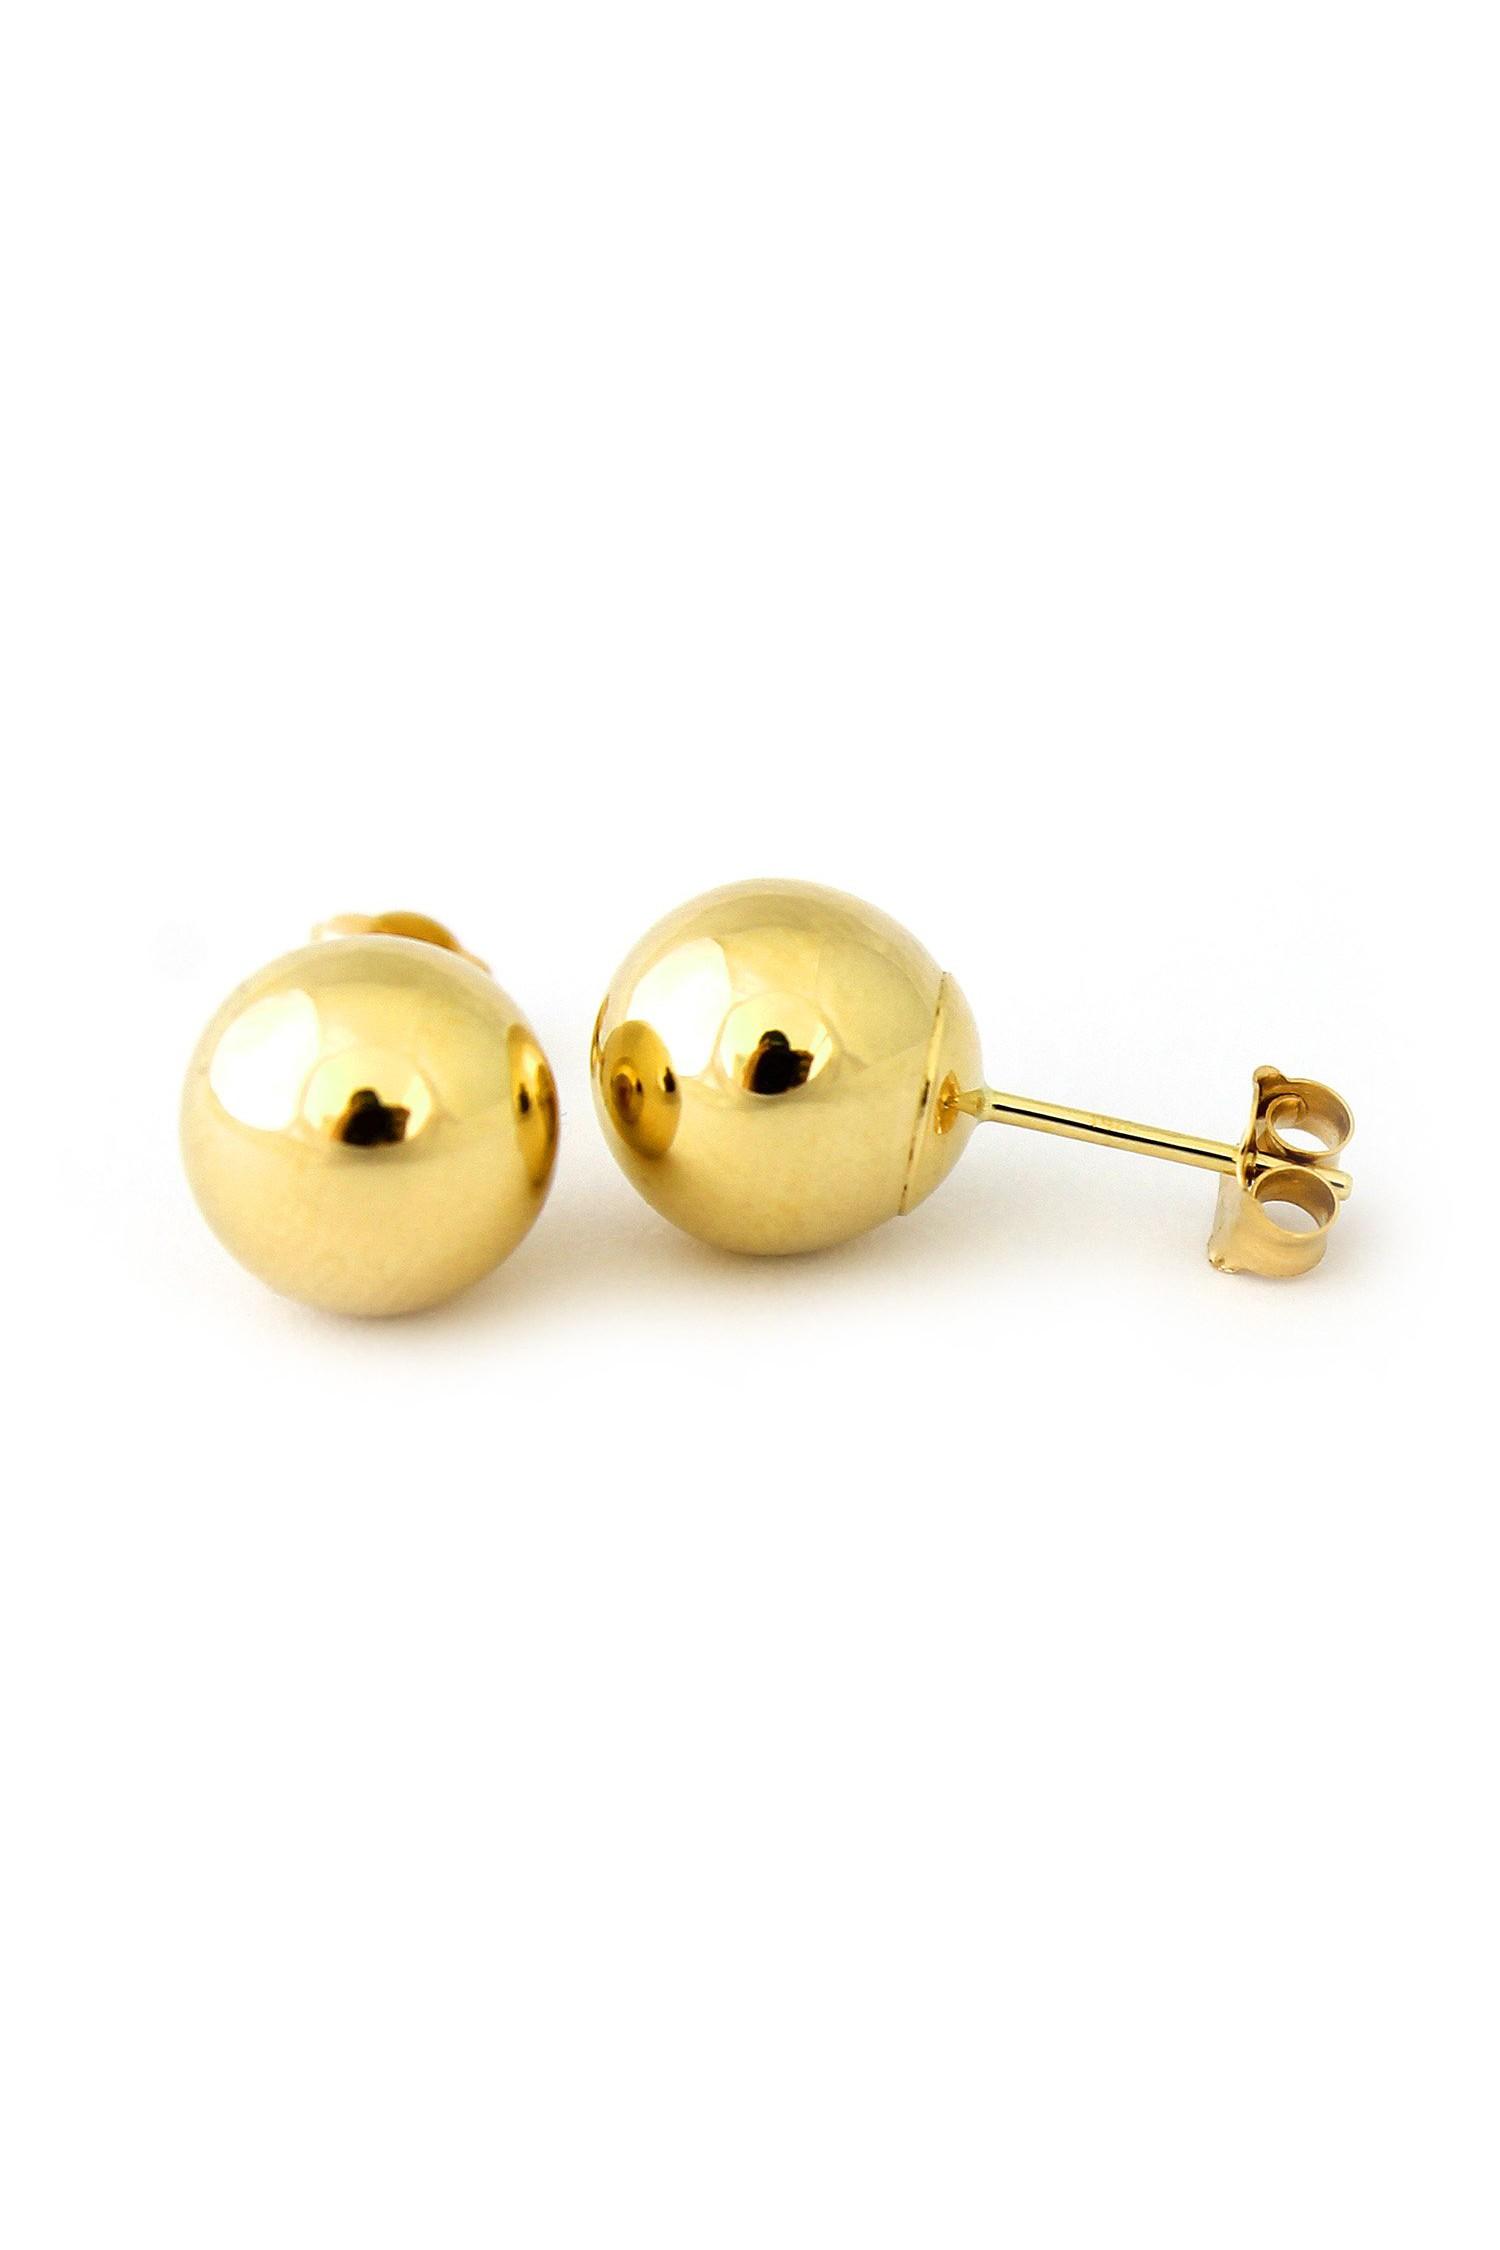 14 Karat Yellow Gold Round Bead Ball Stud Earrings 4mm